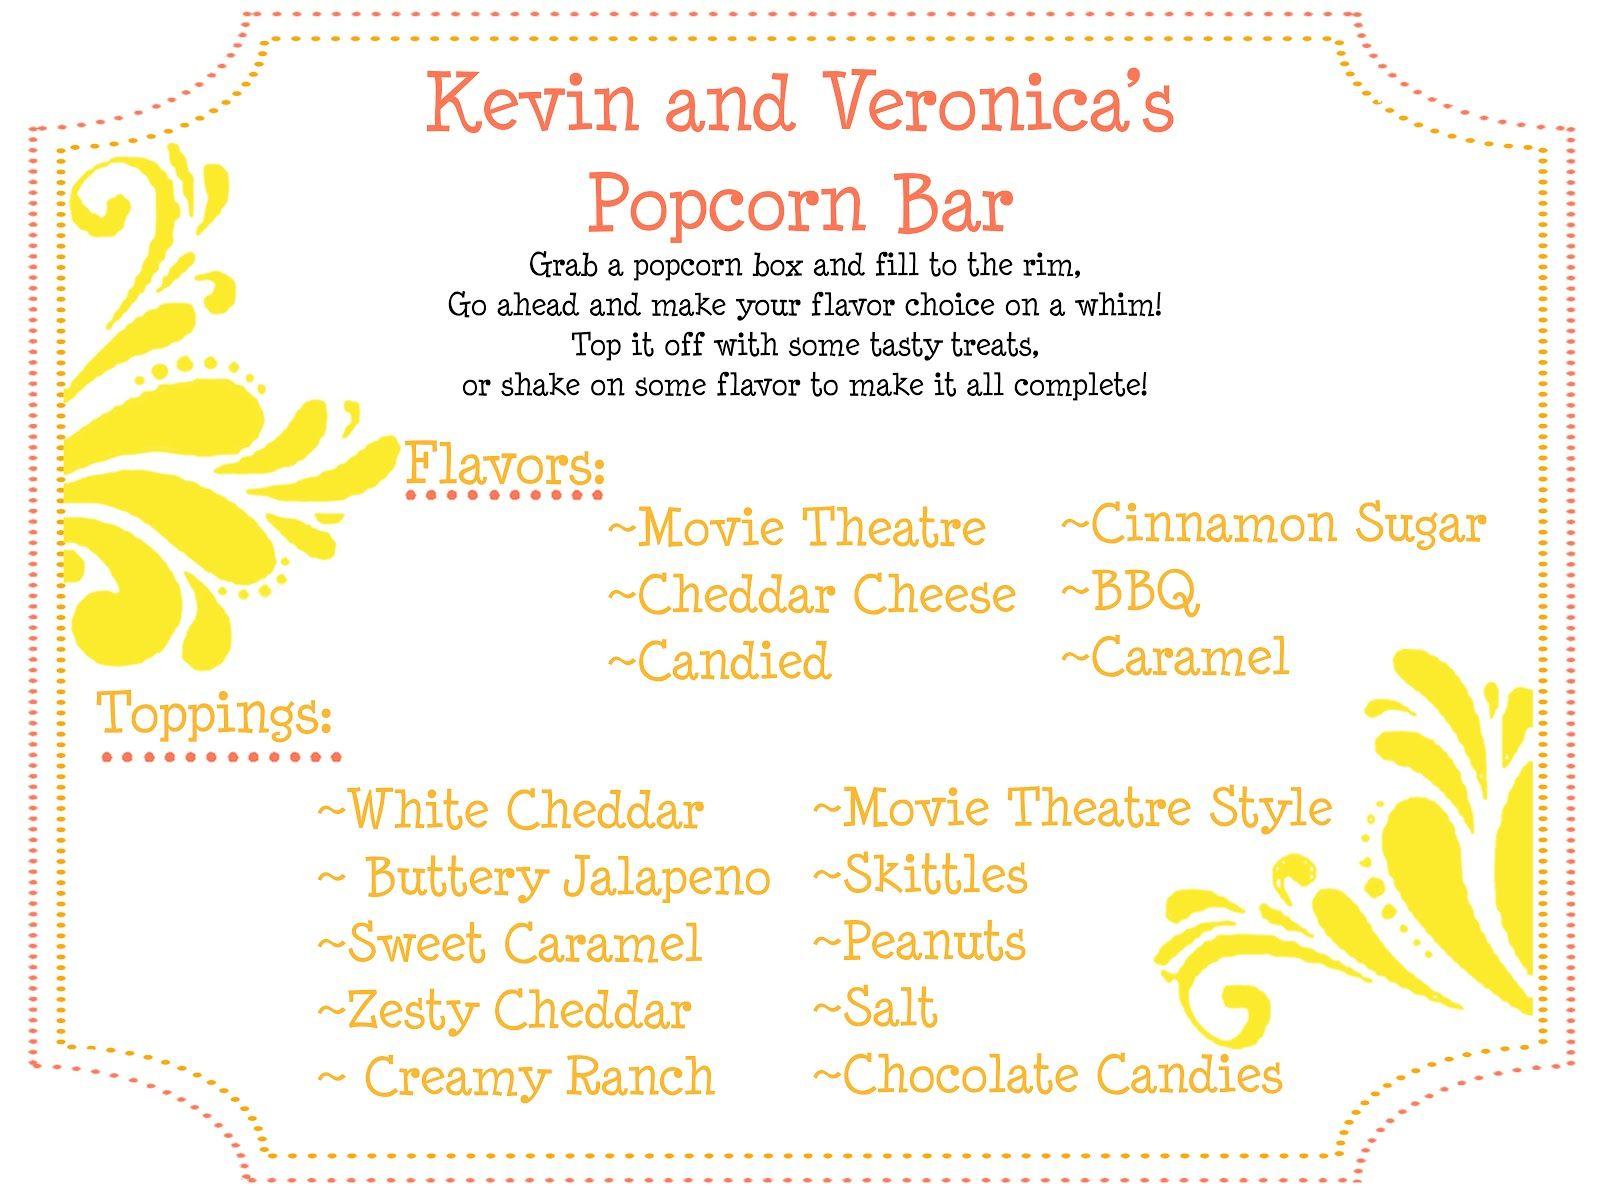 Popcorn Bar Sign with Popcorn riddle | Popcorn Bar | Pinterest ...